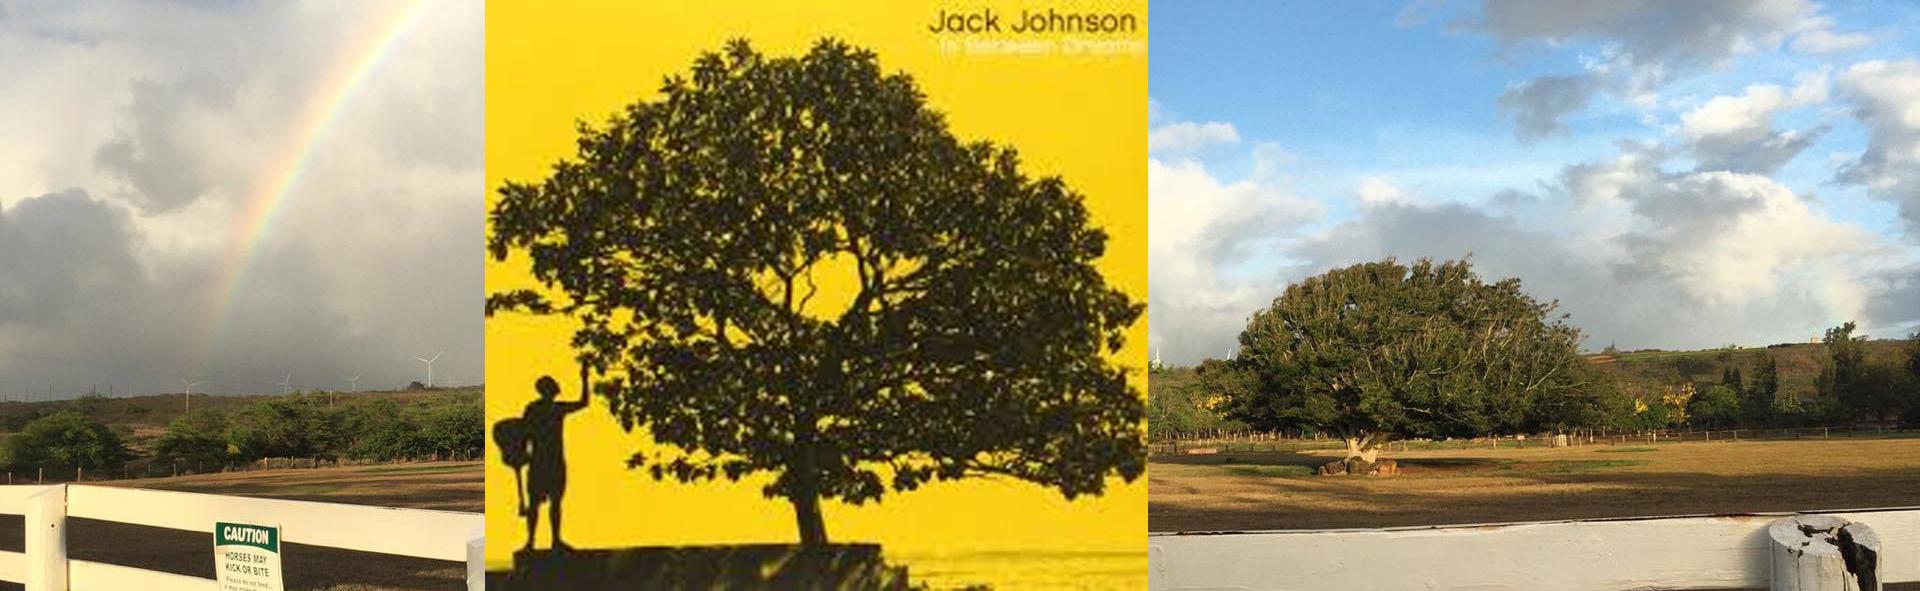 Jack Johnson, Hawaii